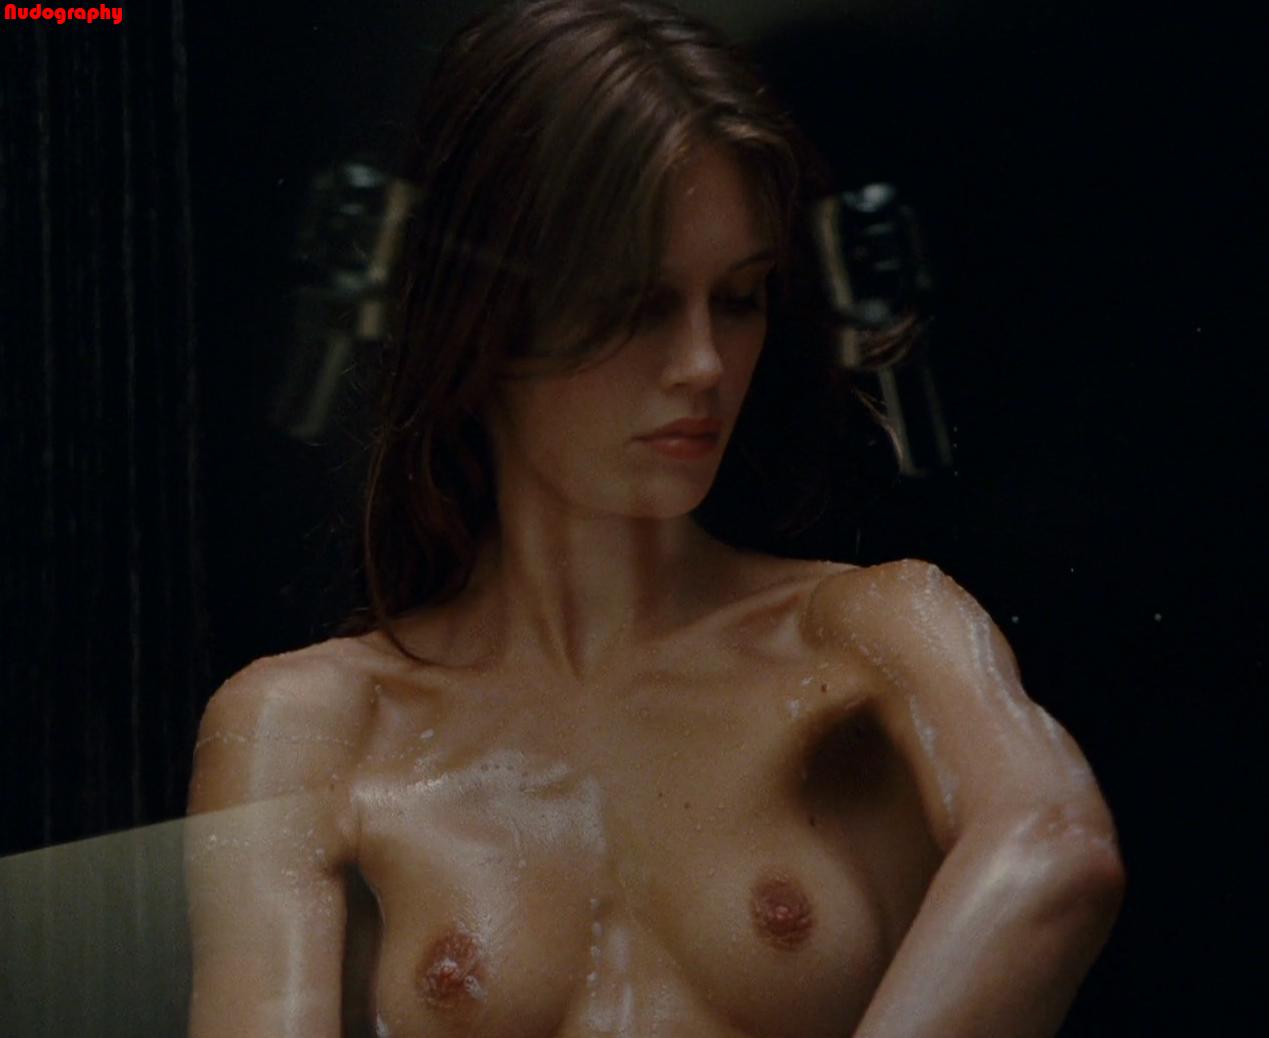 Marine vacth nude and sexy